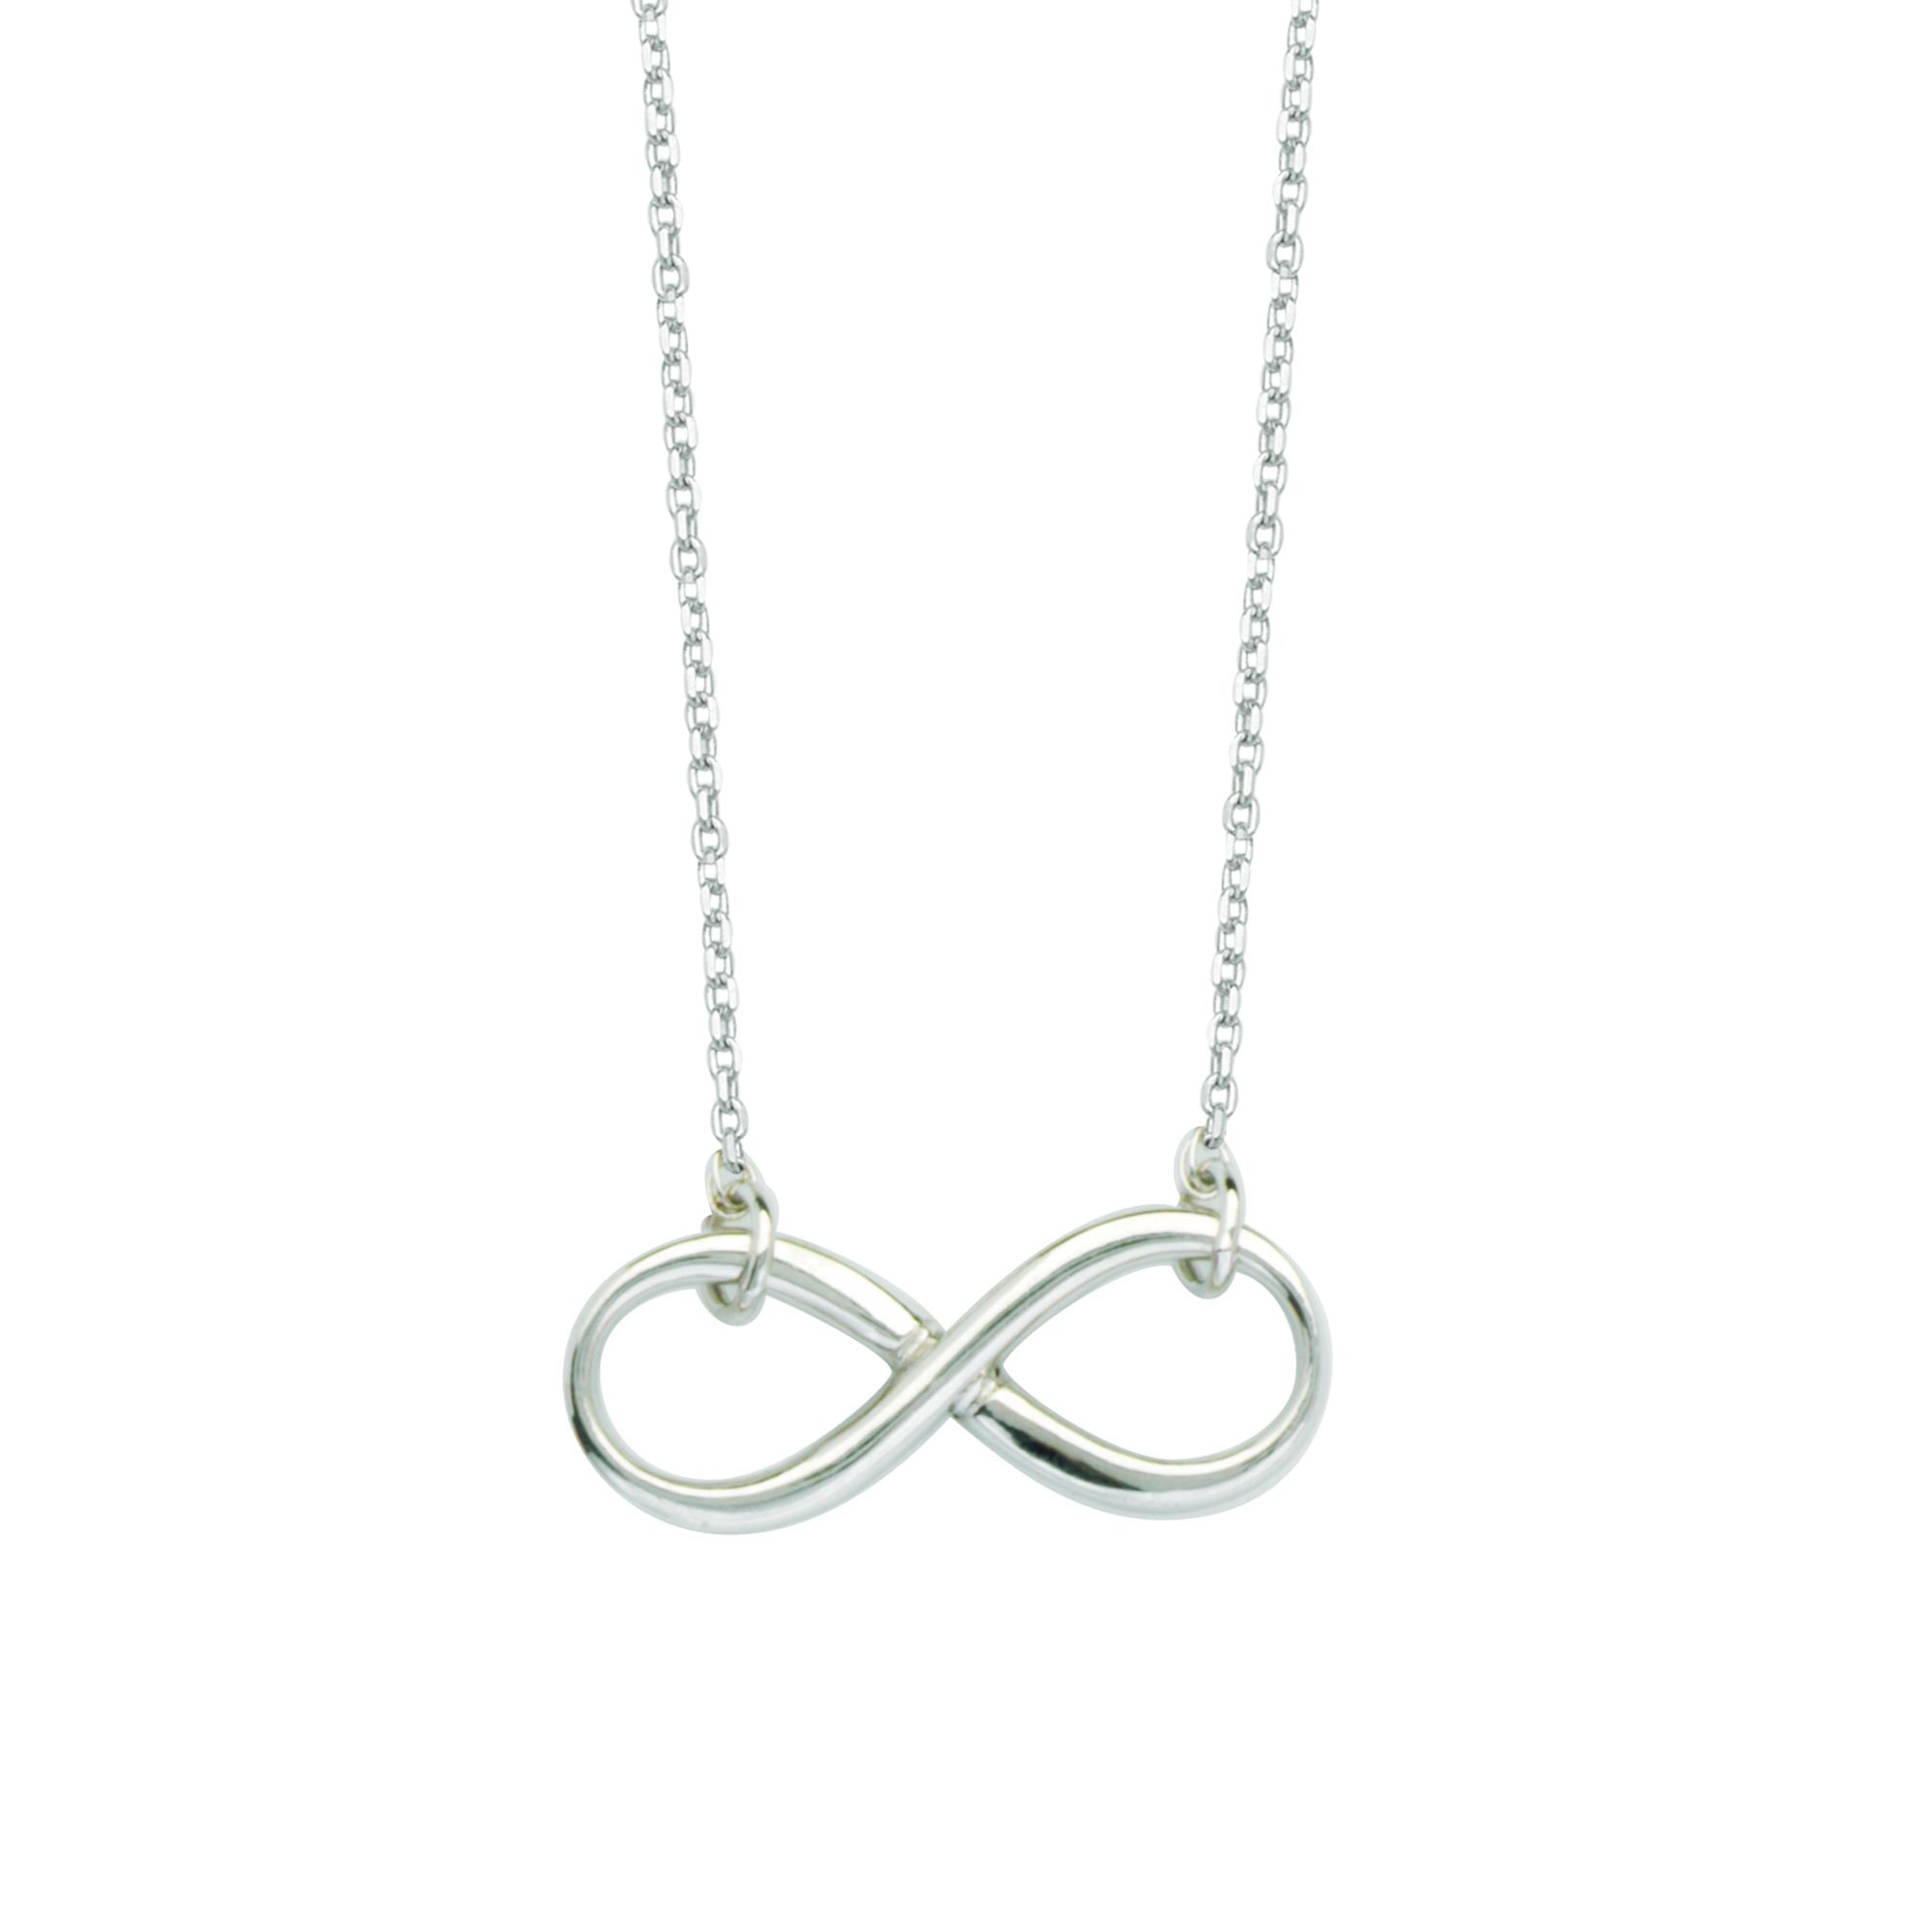 Stering Silver East2West Infinity Earrings